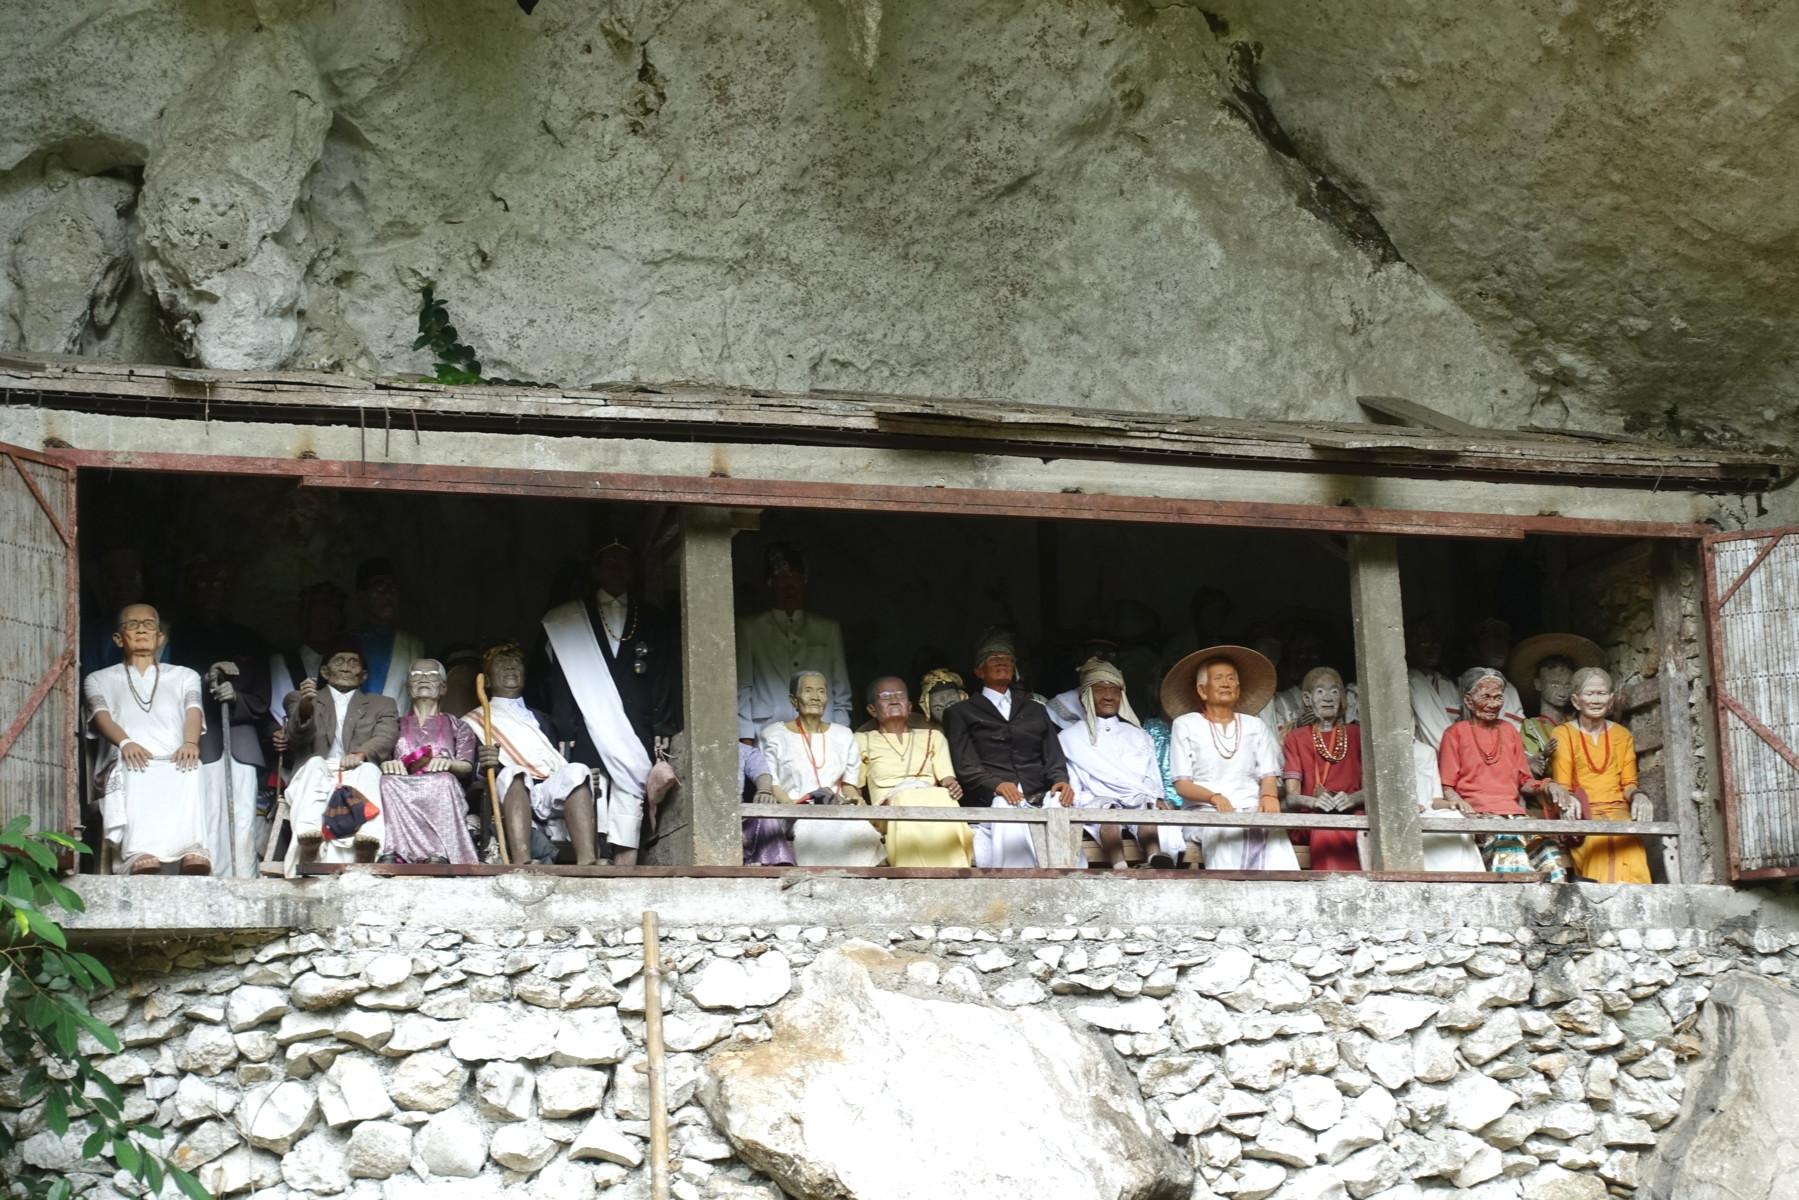 Indonesie_Sulawesi_Toraja_Rantepao DSC05105